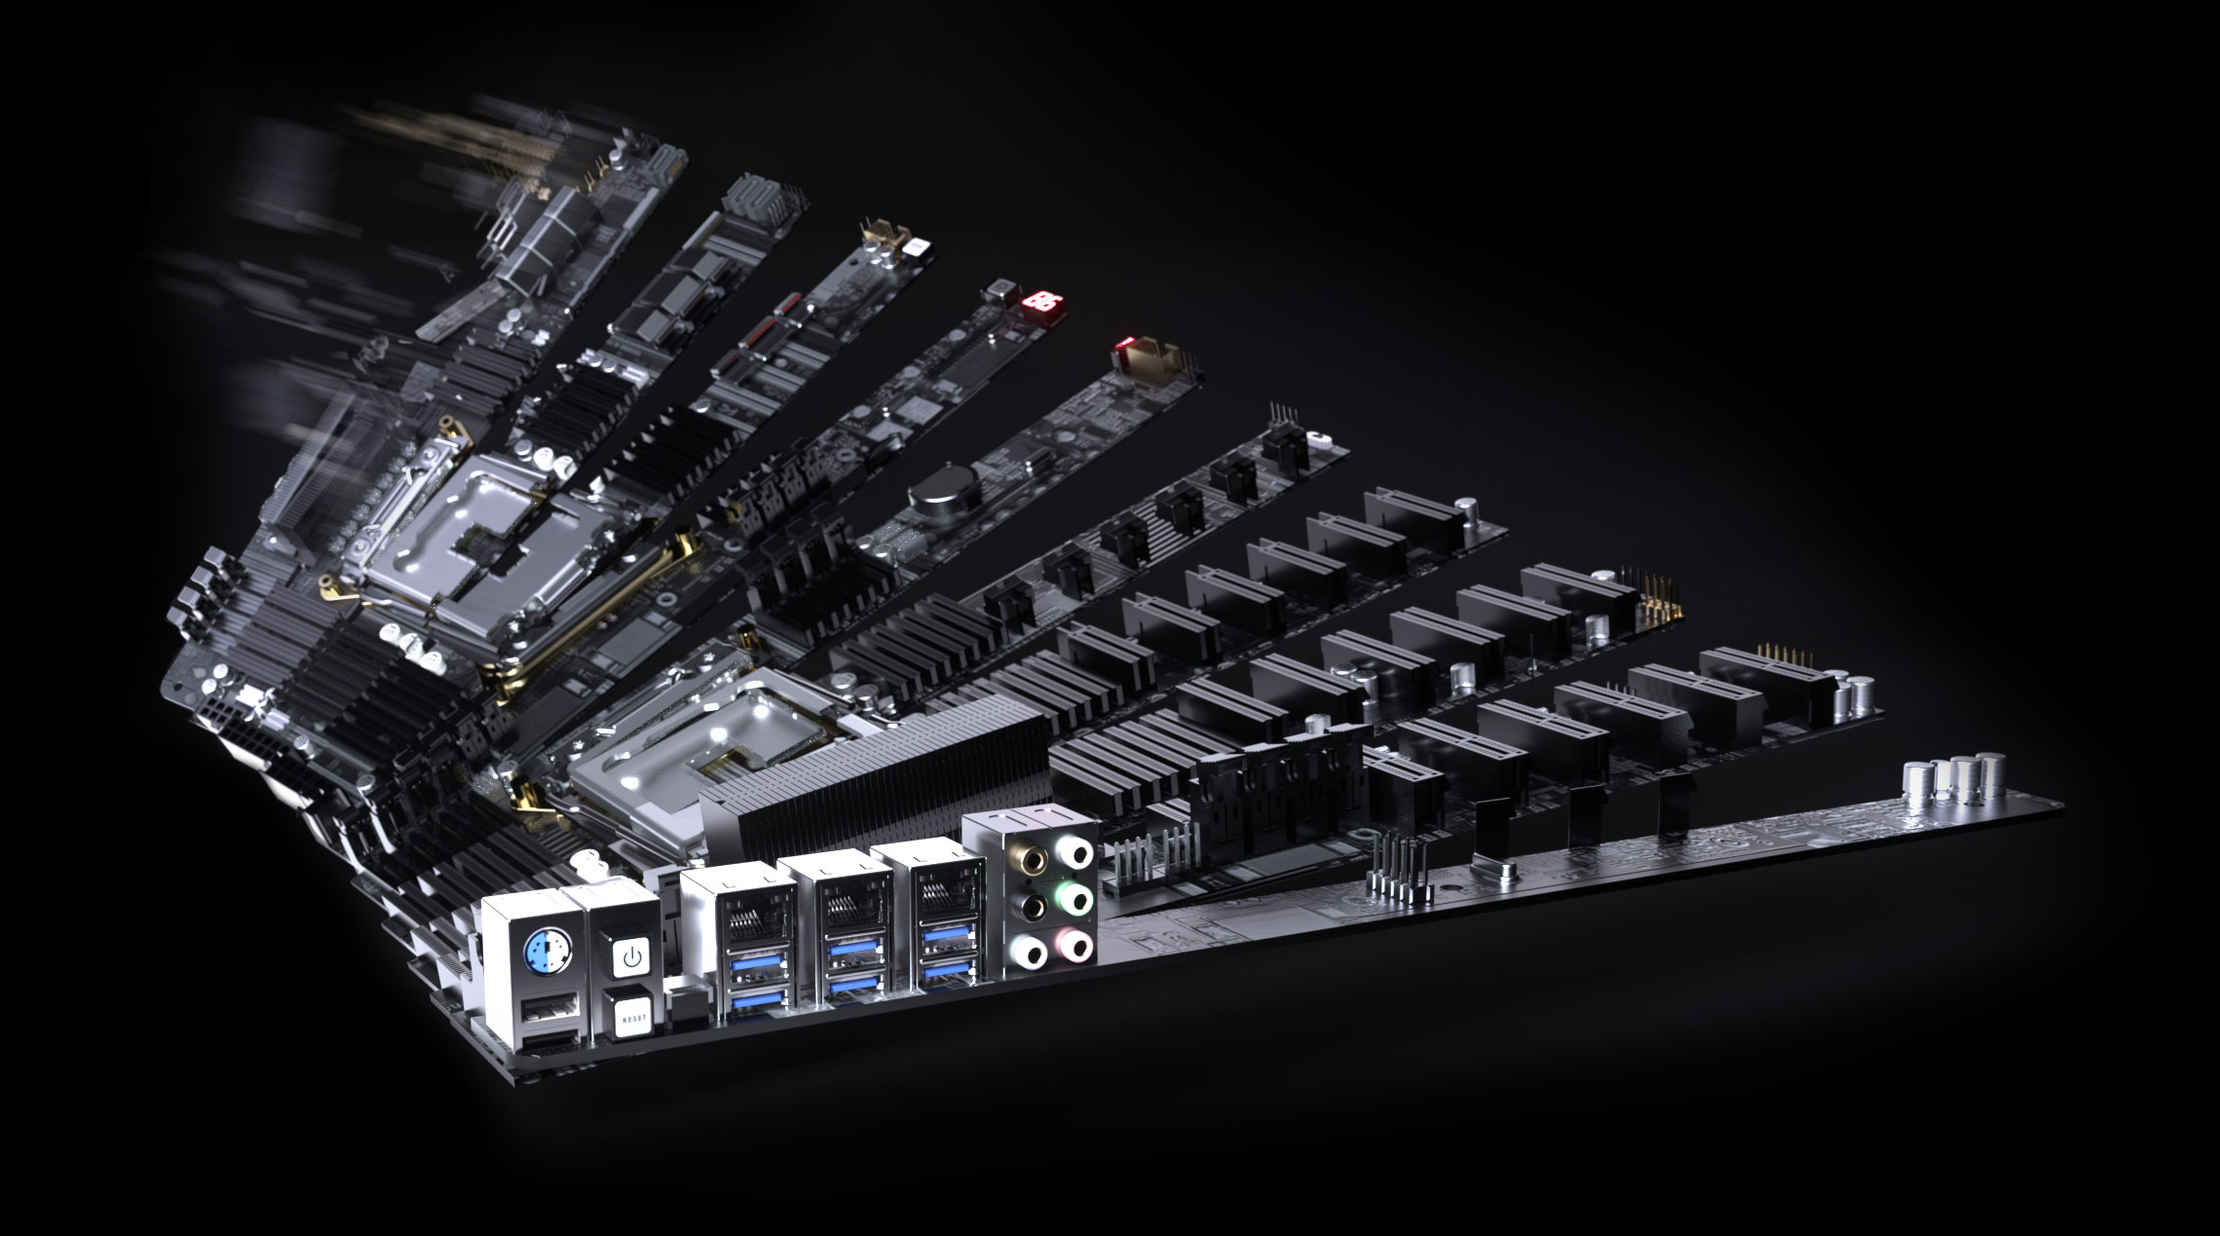 mairec edelmetall precious metals recycling material elektronikschrott electronic waste